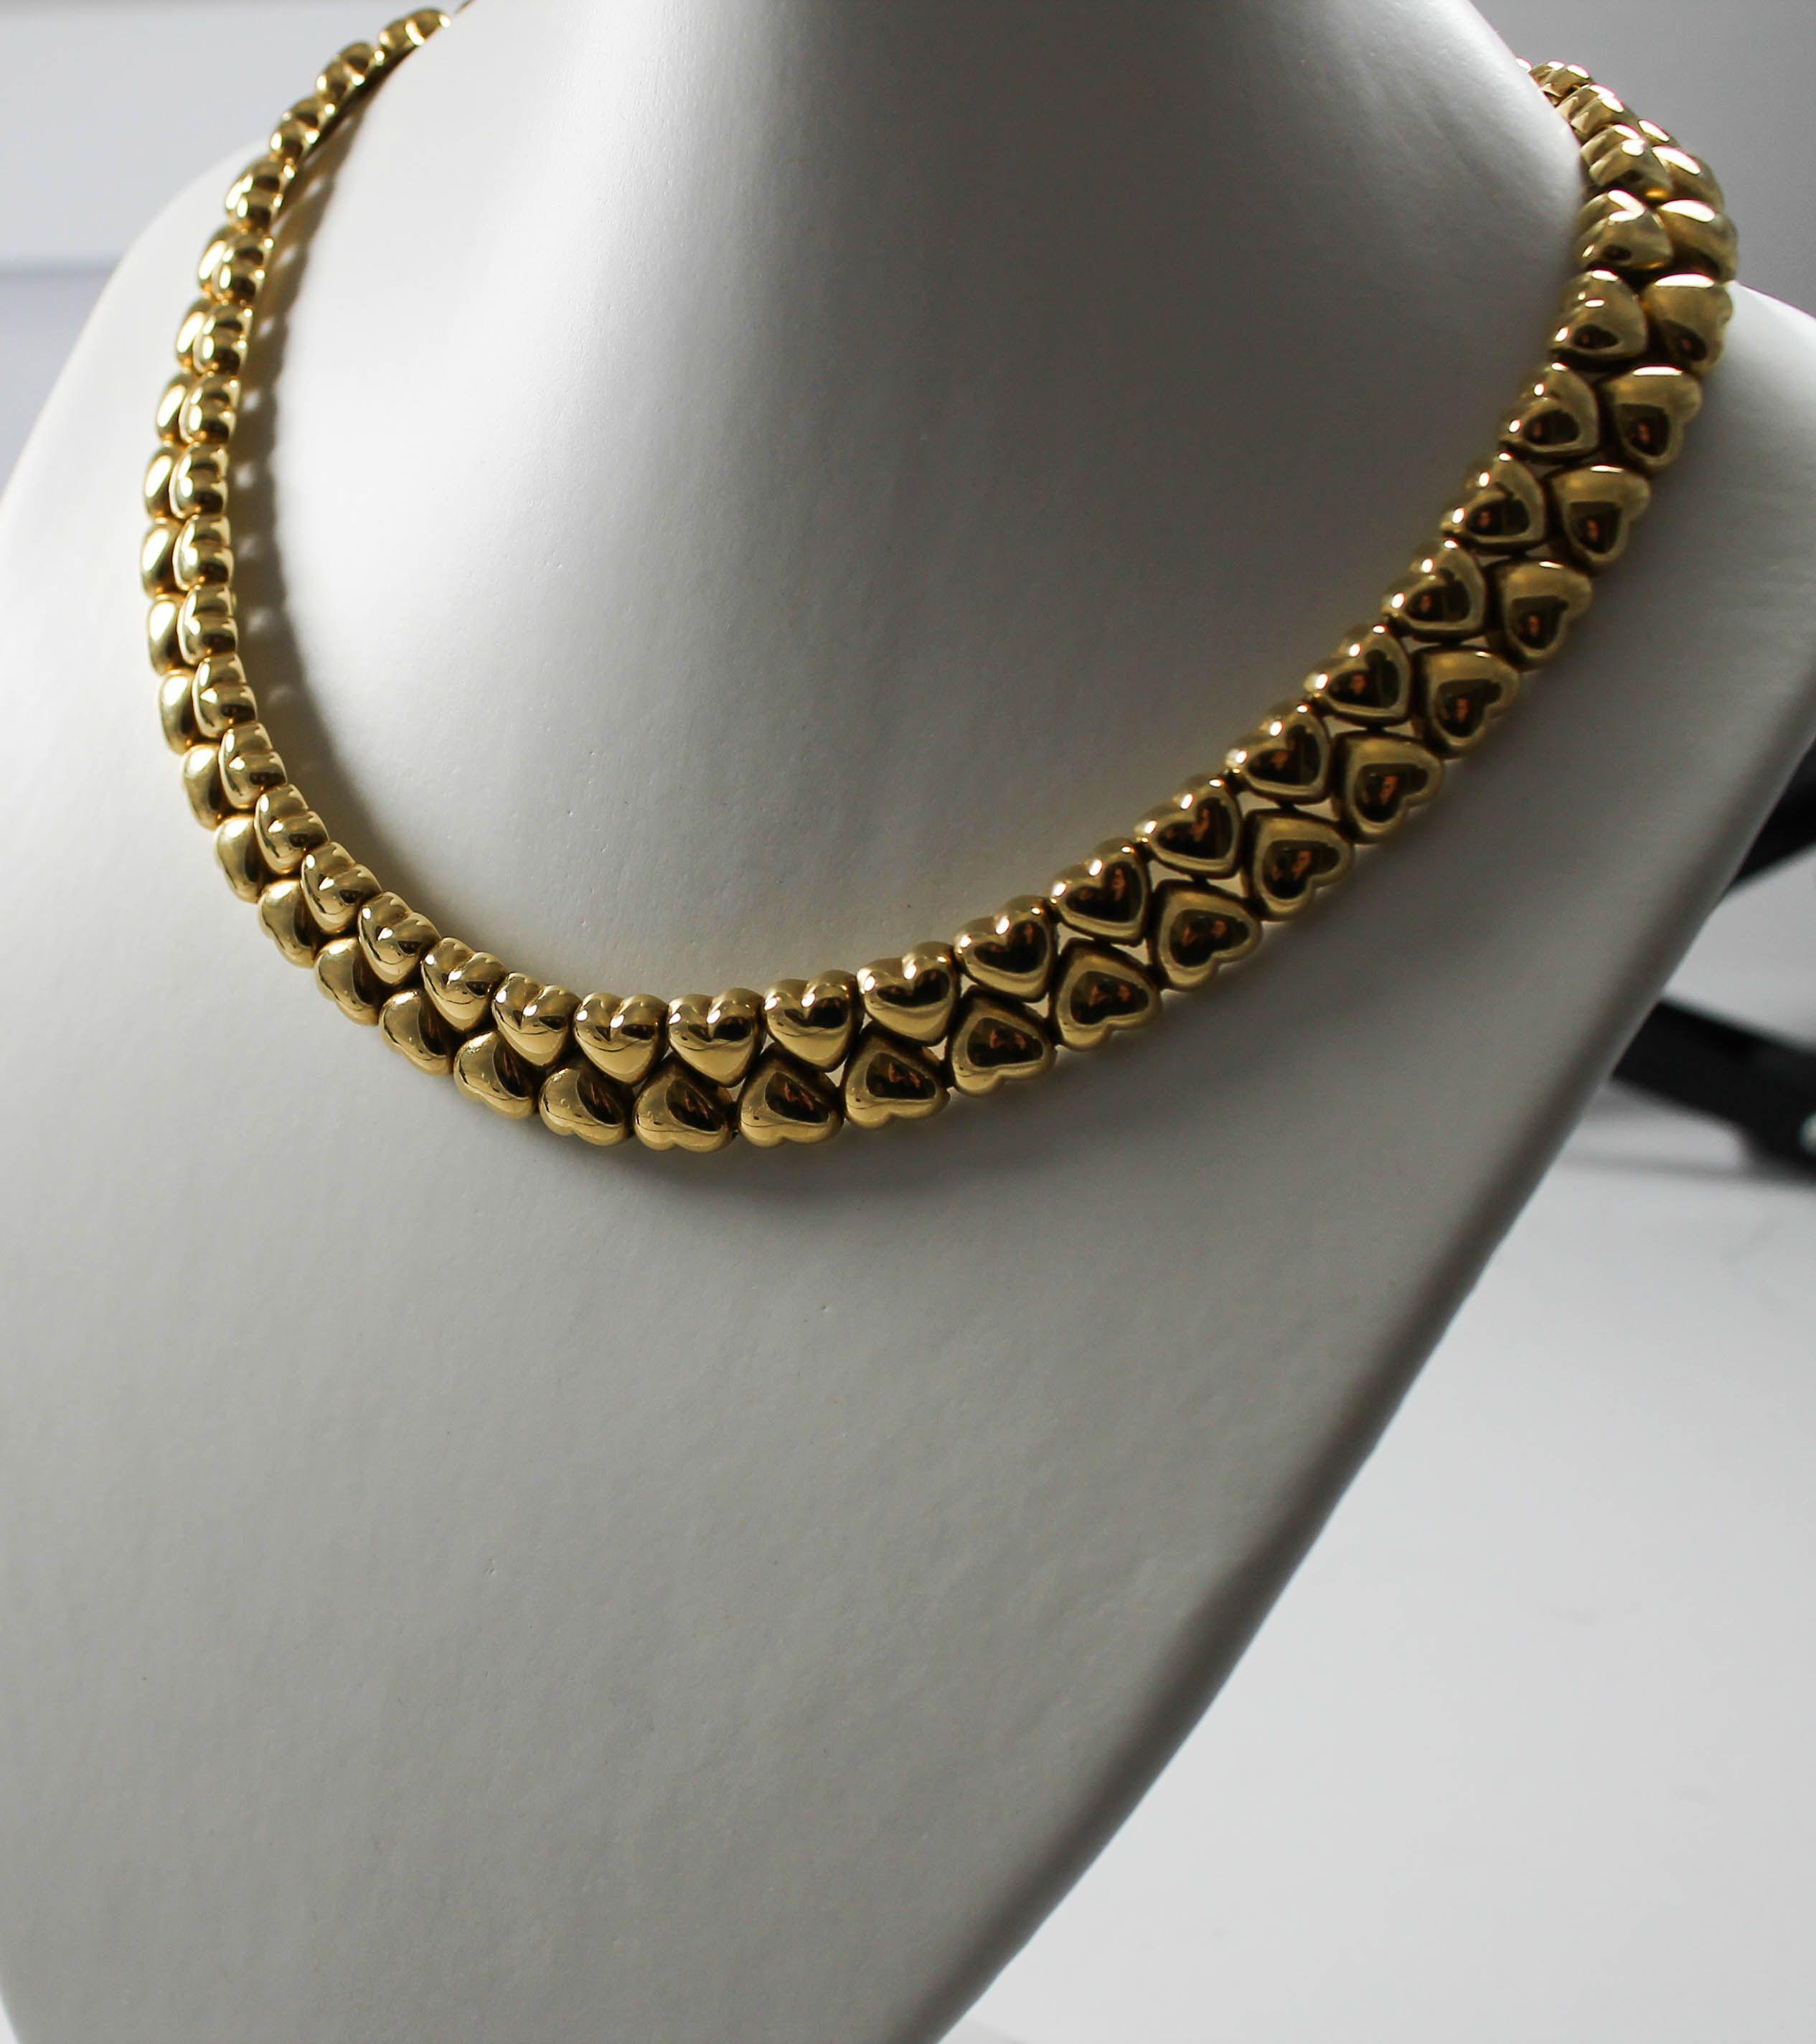 Schmuckmarken  Cartier echtes Collier Damen Halskette Gold https://www.ipfand.de ...